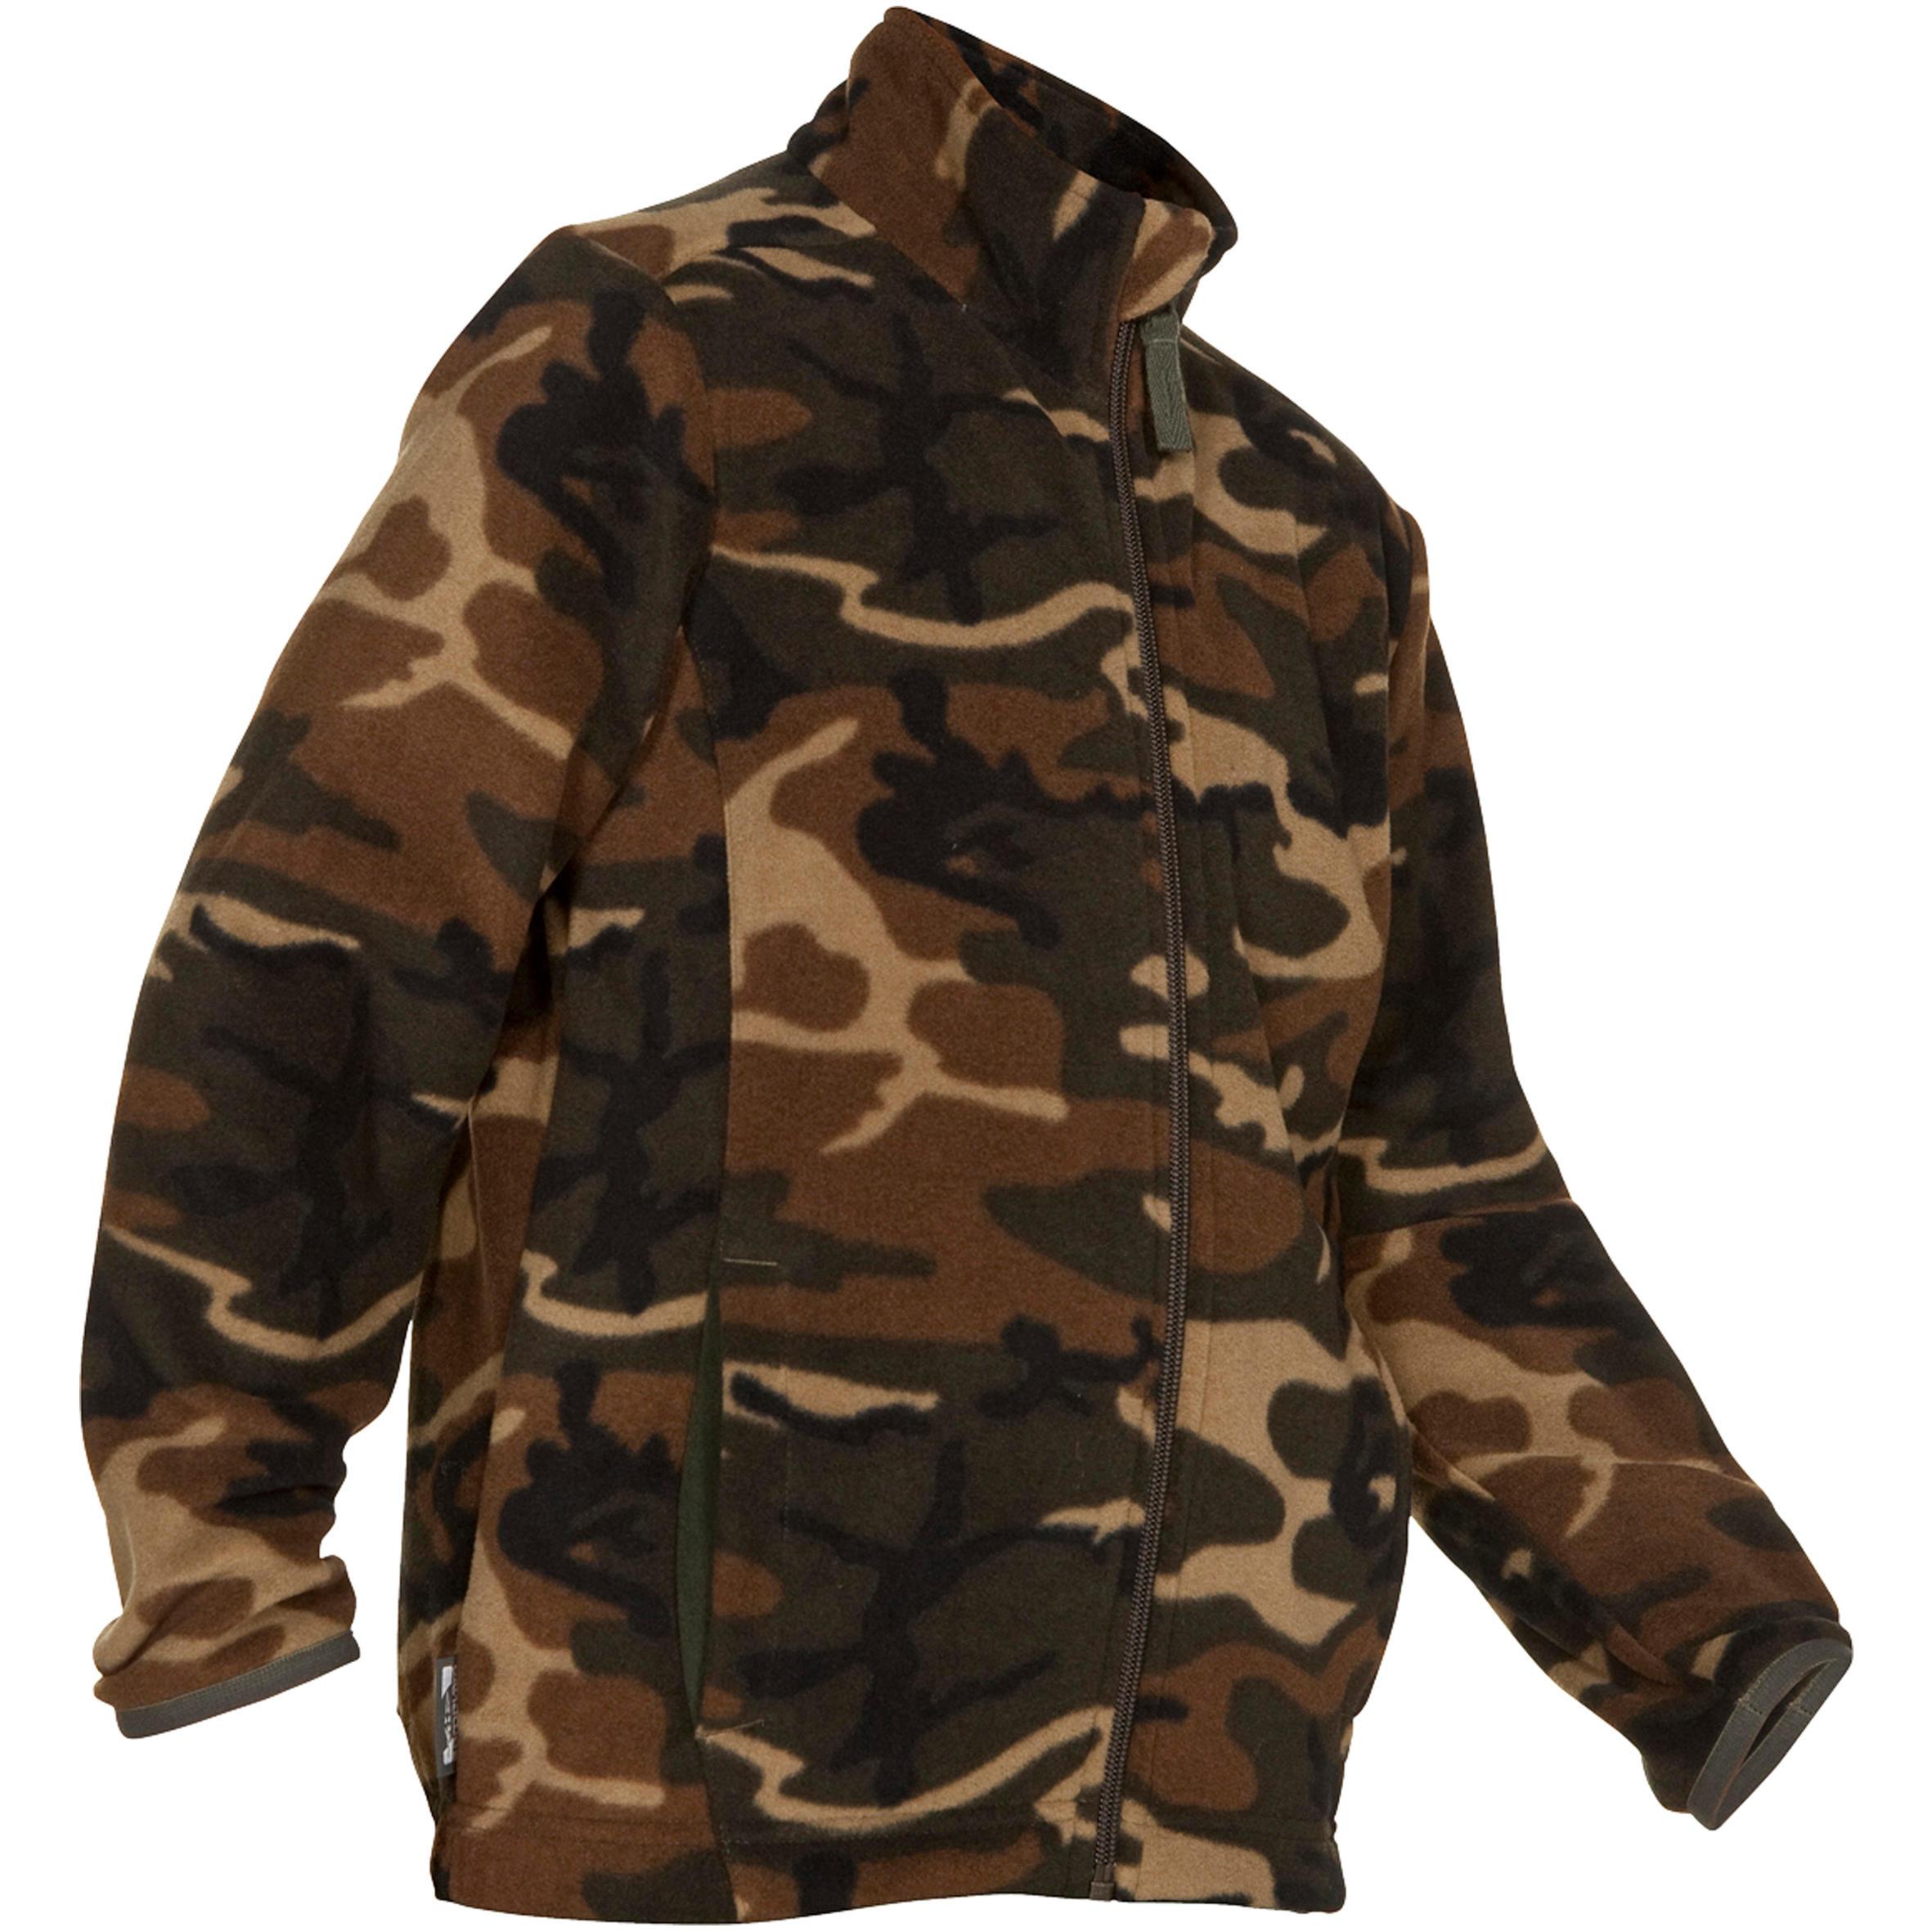 Junior Hunting Fleece Sweater - Green